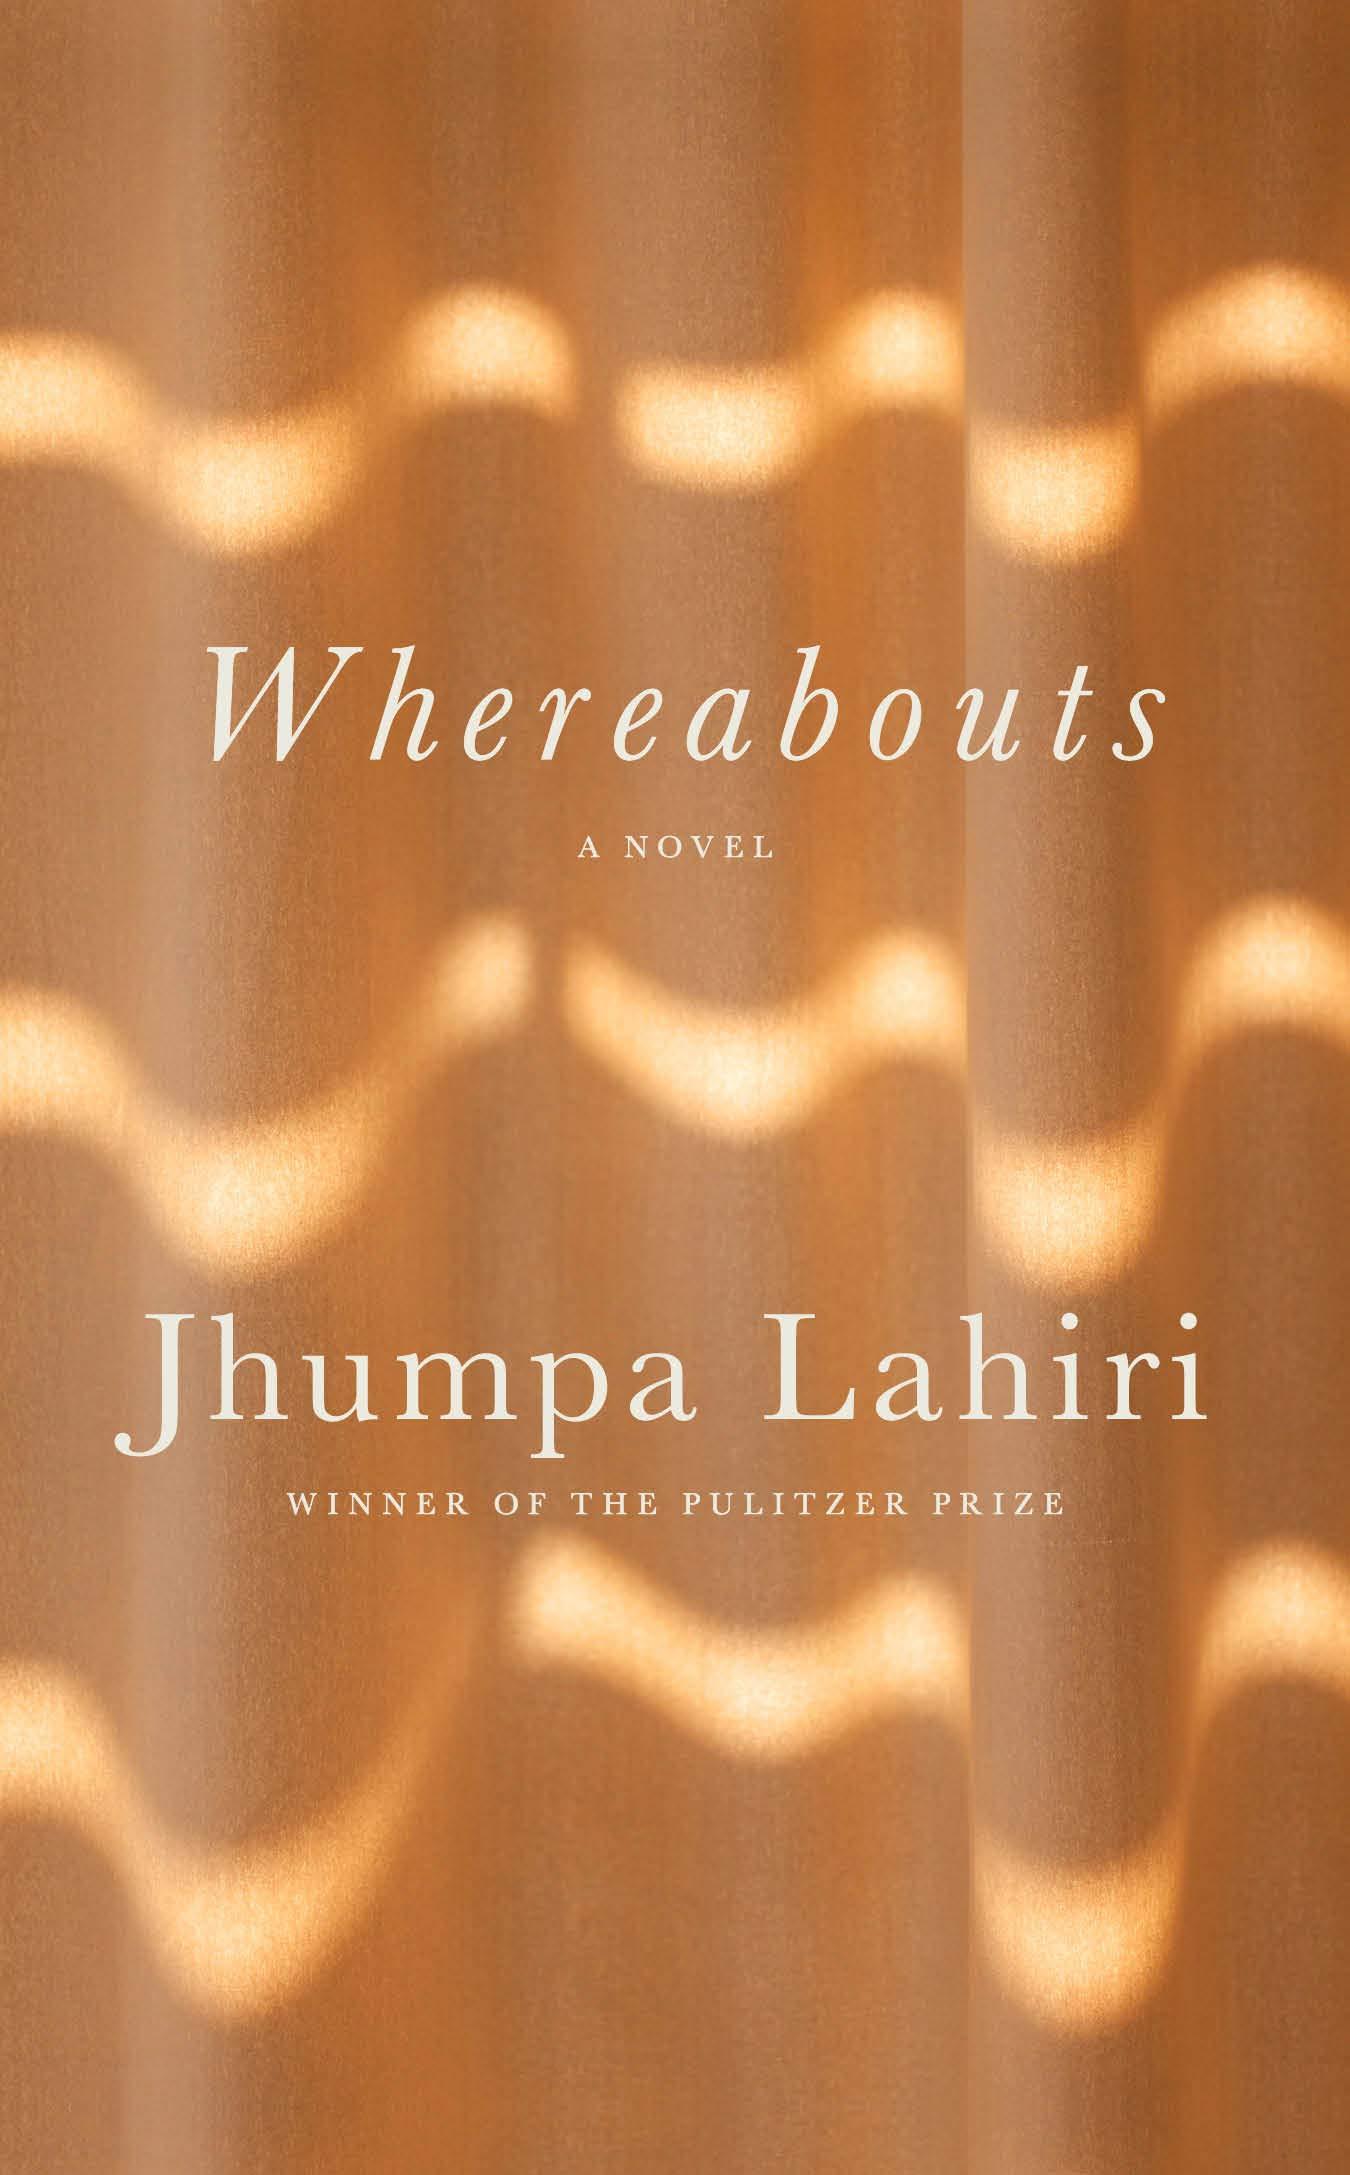 Whereabouts: A novel: Lahiri, Jhumpa: 9780593318317: Amazon.com: Books